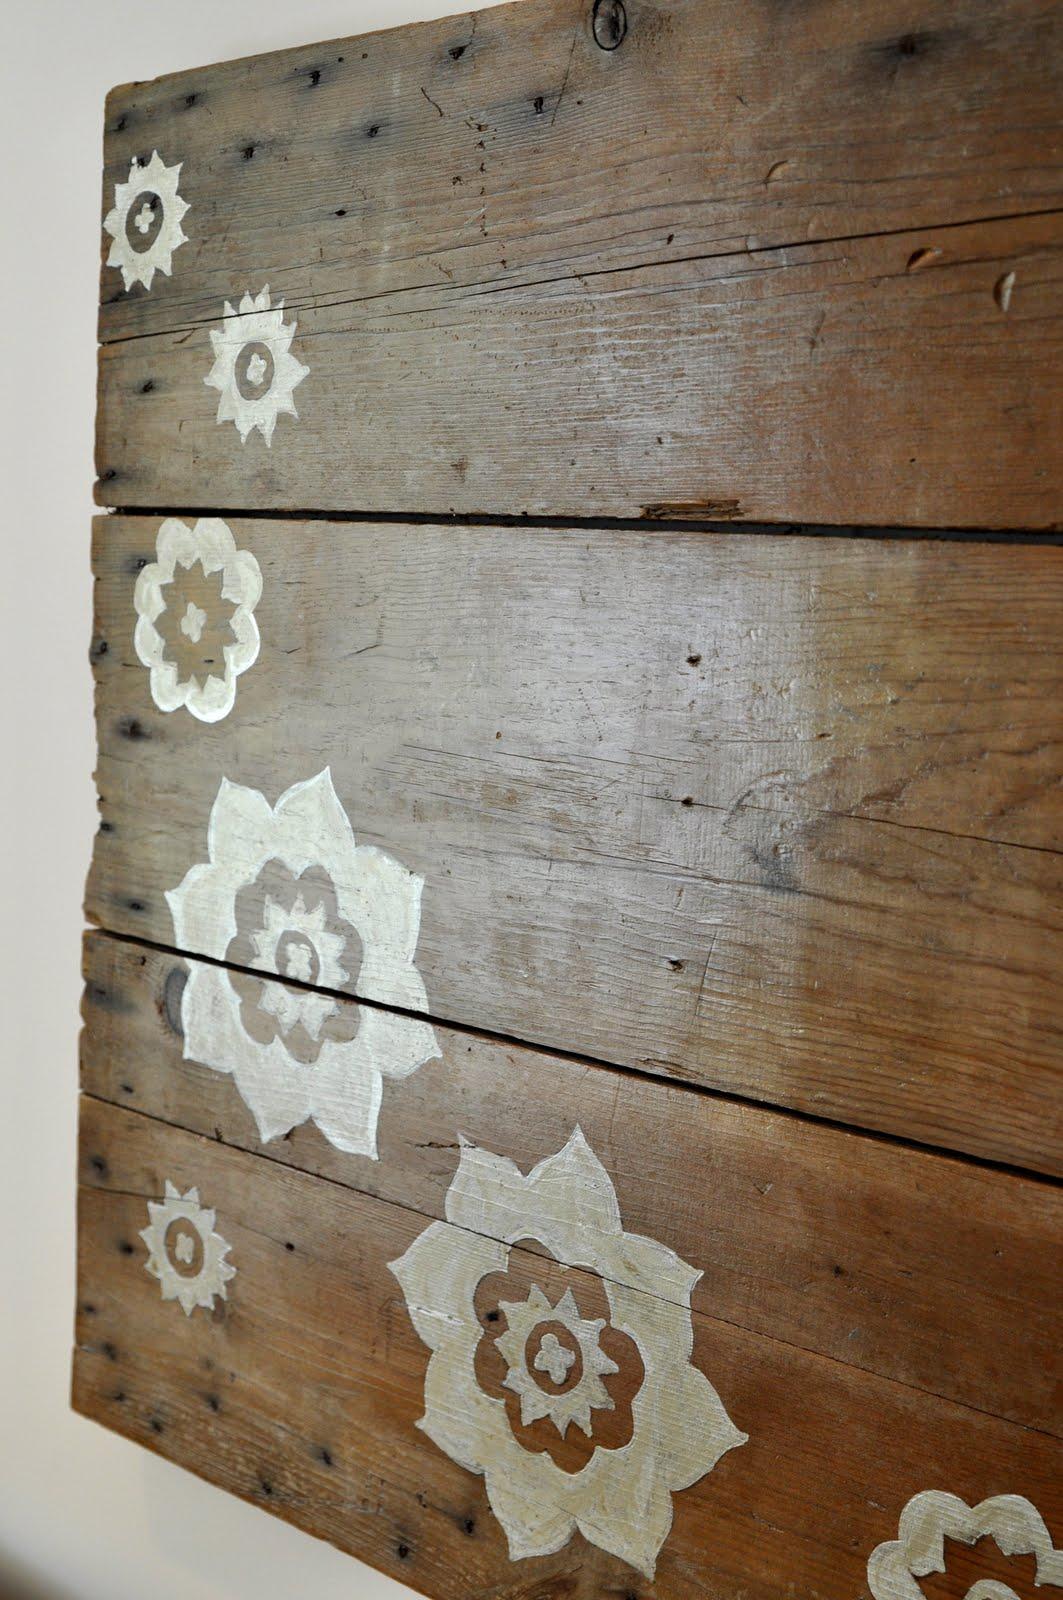 Barn Wood Decor Signs: Barnwood Artwork